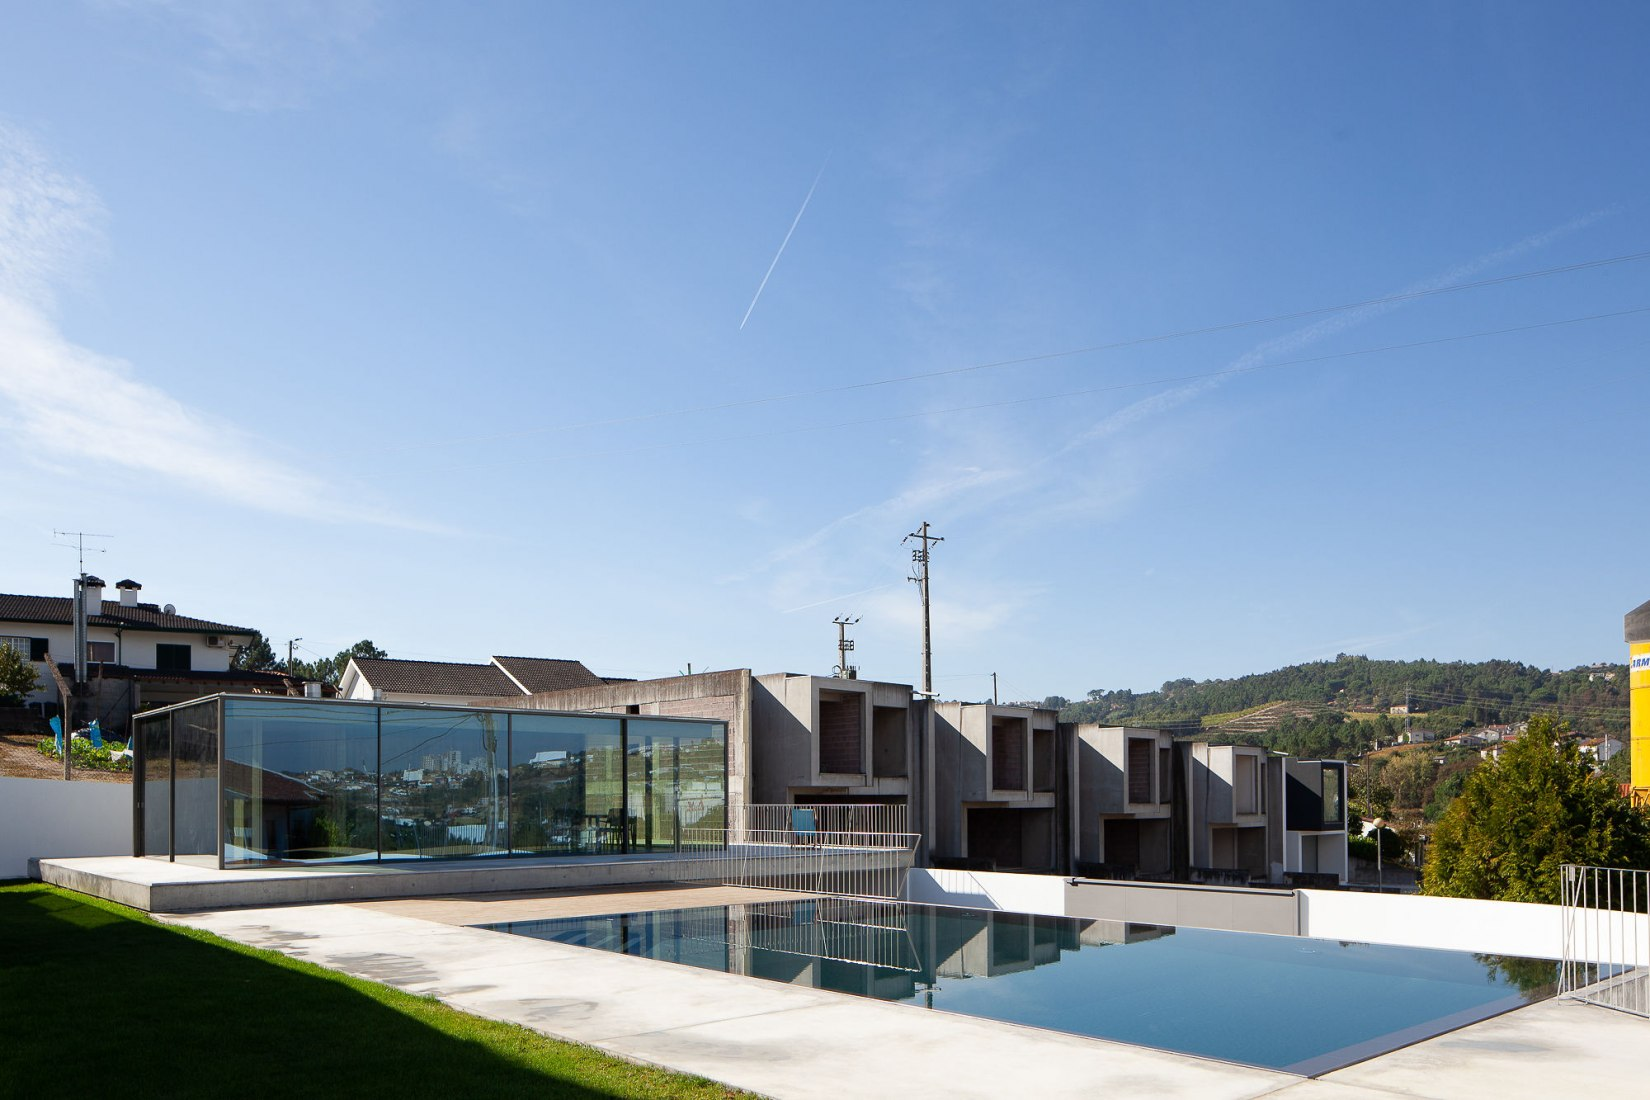 Pool Pavilion by Antonio Cruz Lopes Architect. Photograph by Jose Campos.